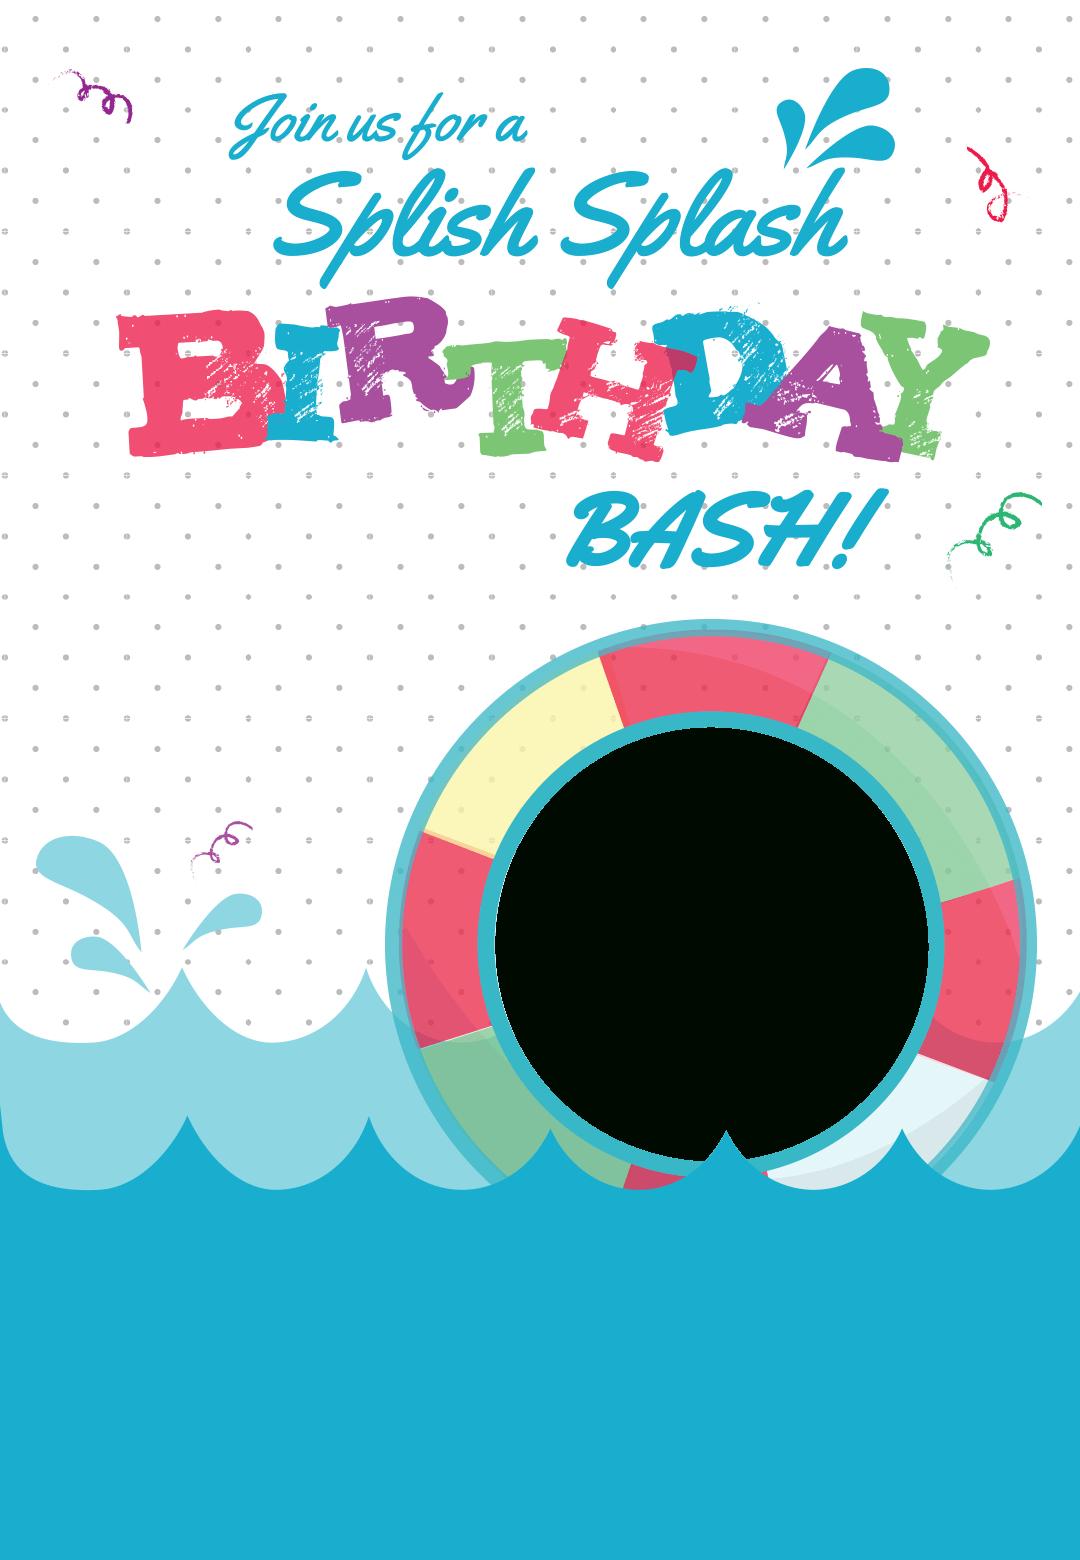 Splish Splash - Free Printable Summer Party Invitation Template - Free Printable Water Park Birthday Invitations